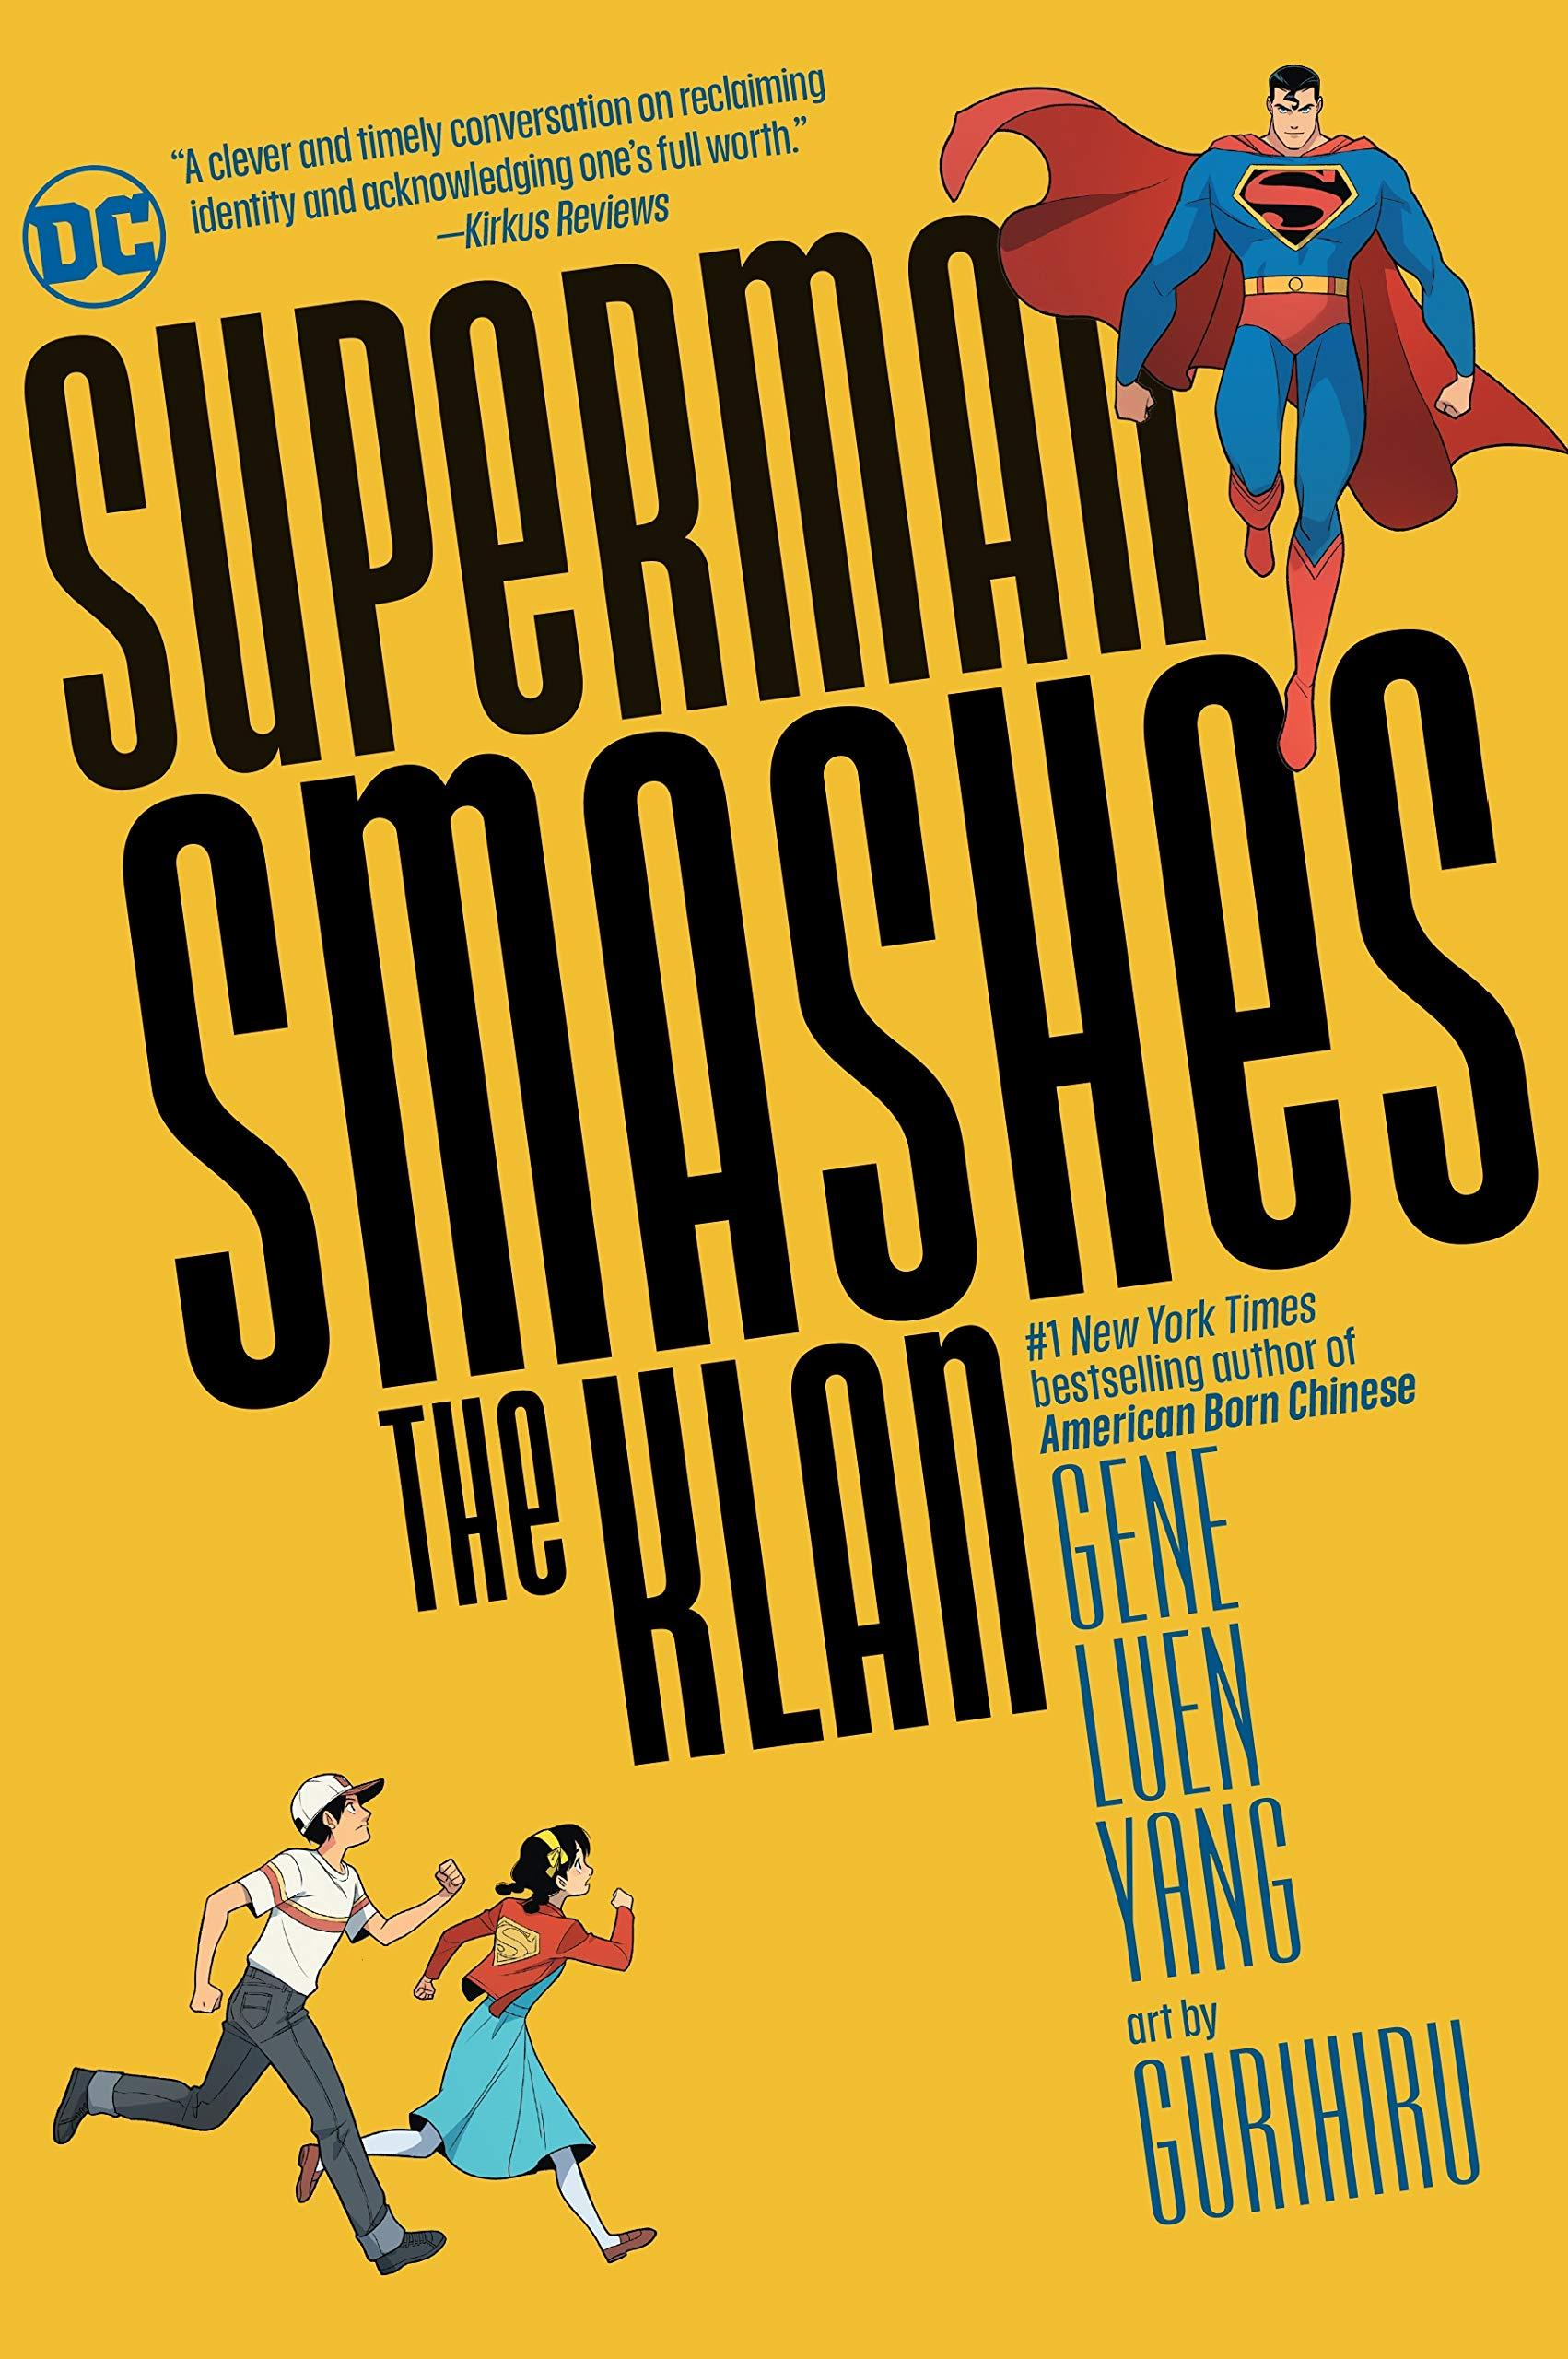 Amazon.com: Superman Smashes the Klan (9781779504210): Yang, Gene Luen, Gurihiru: Books